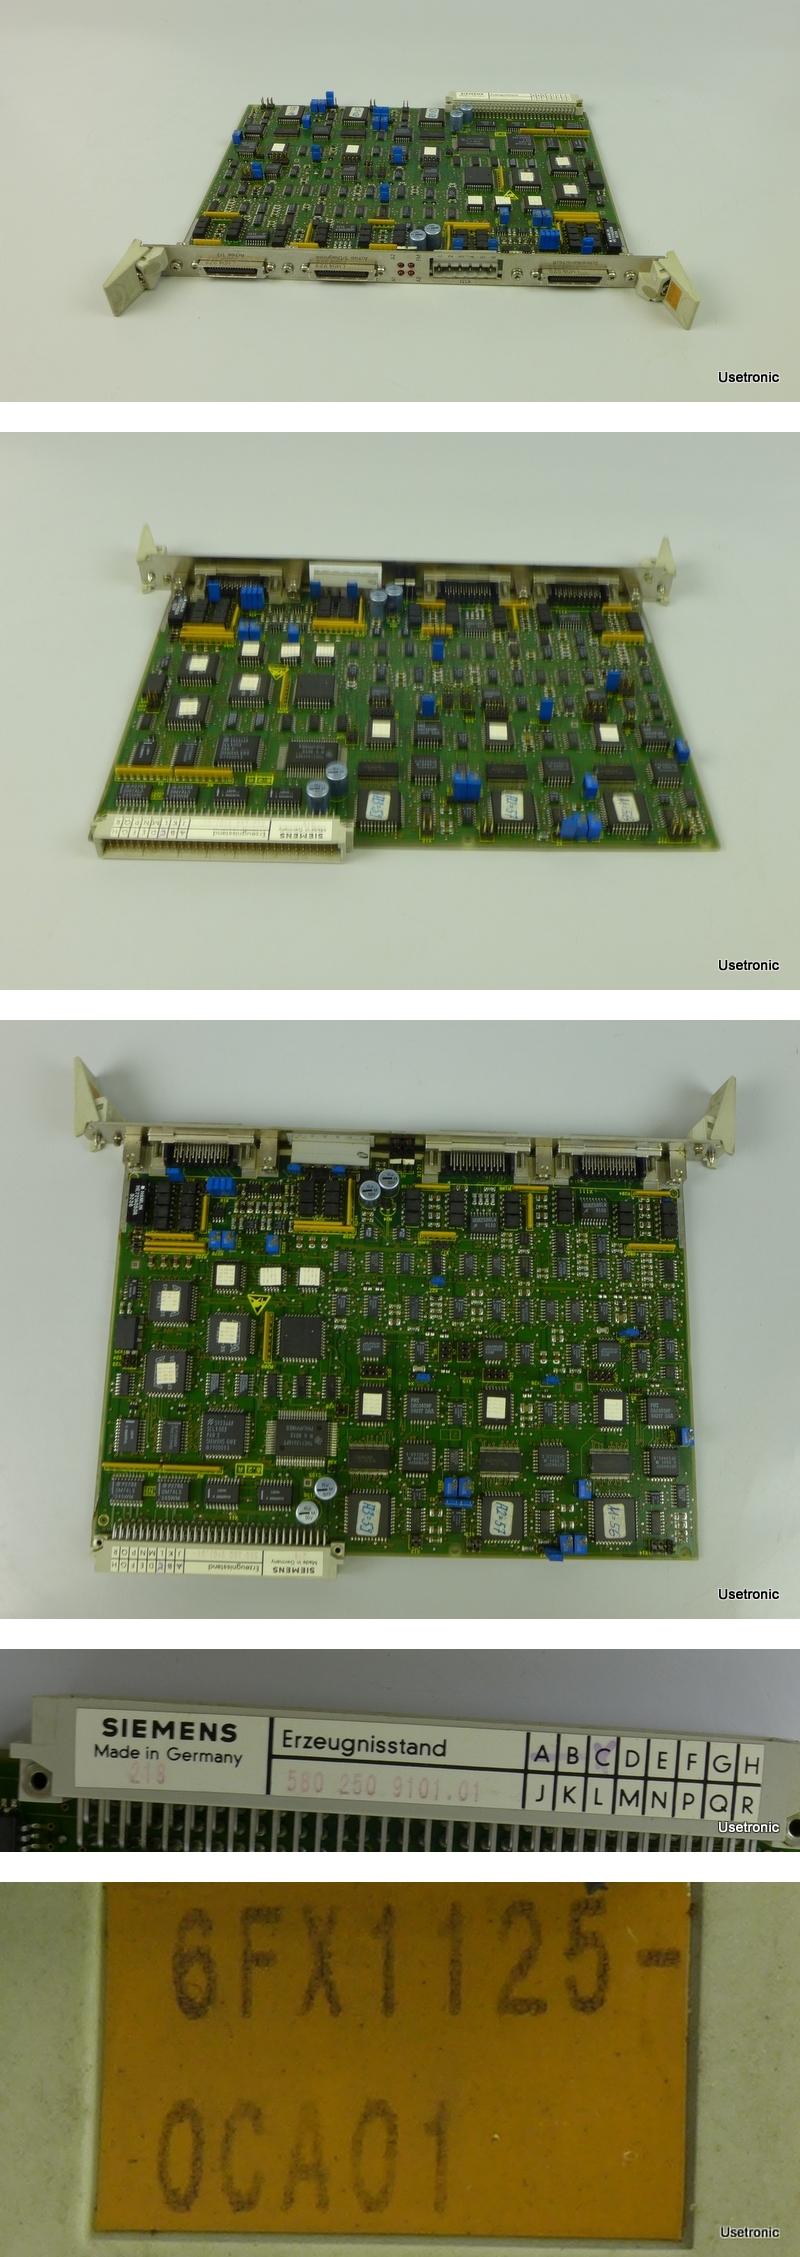 Siemens 6FX1125-0CA01